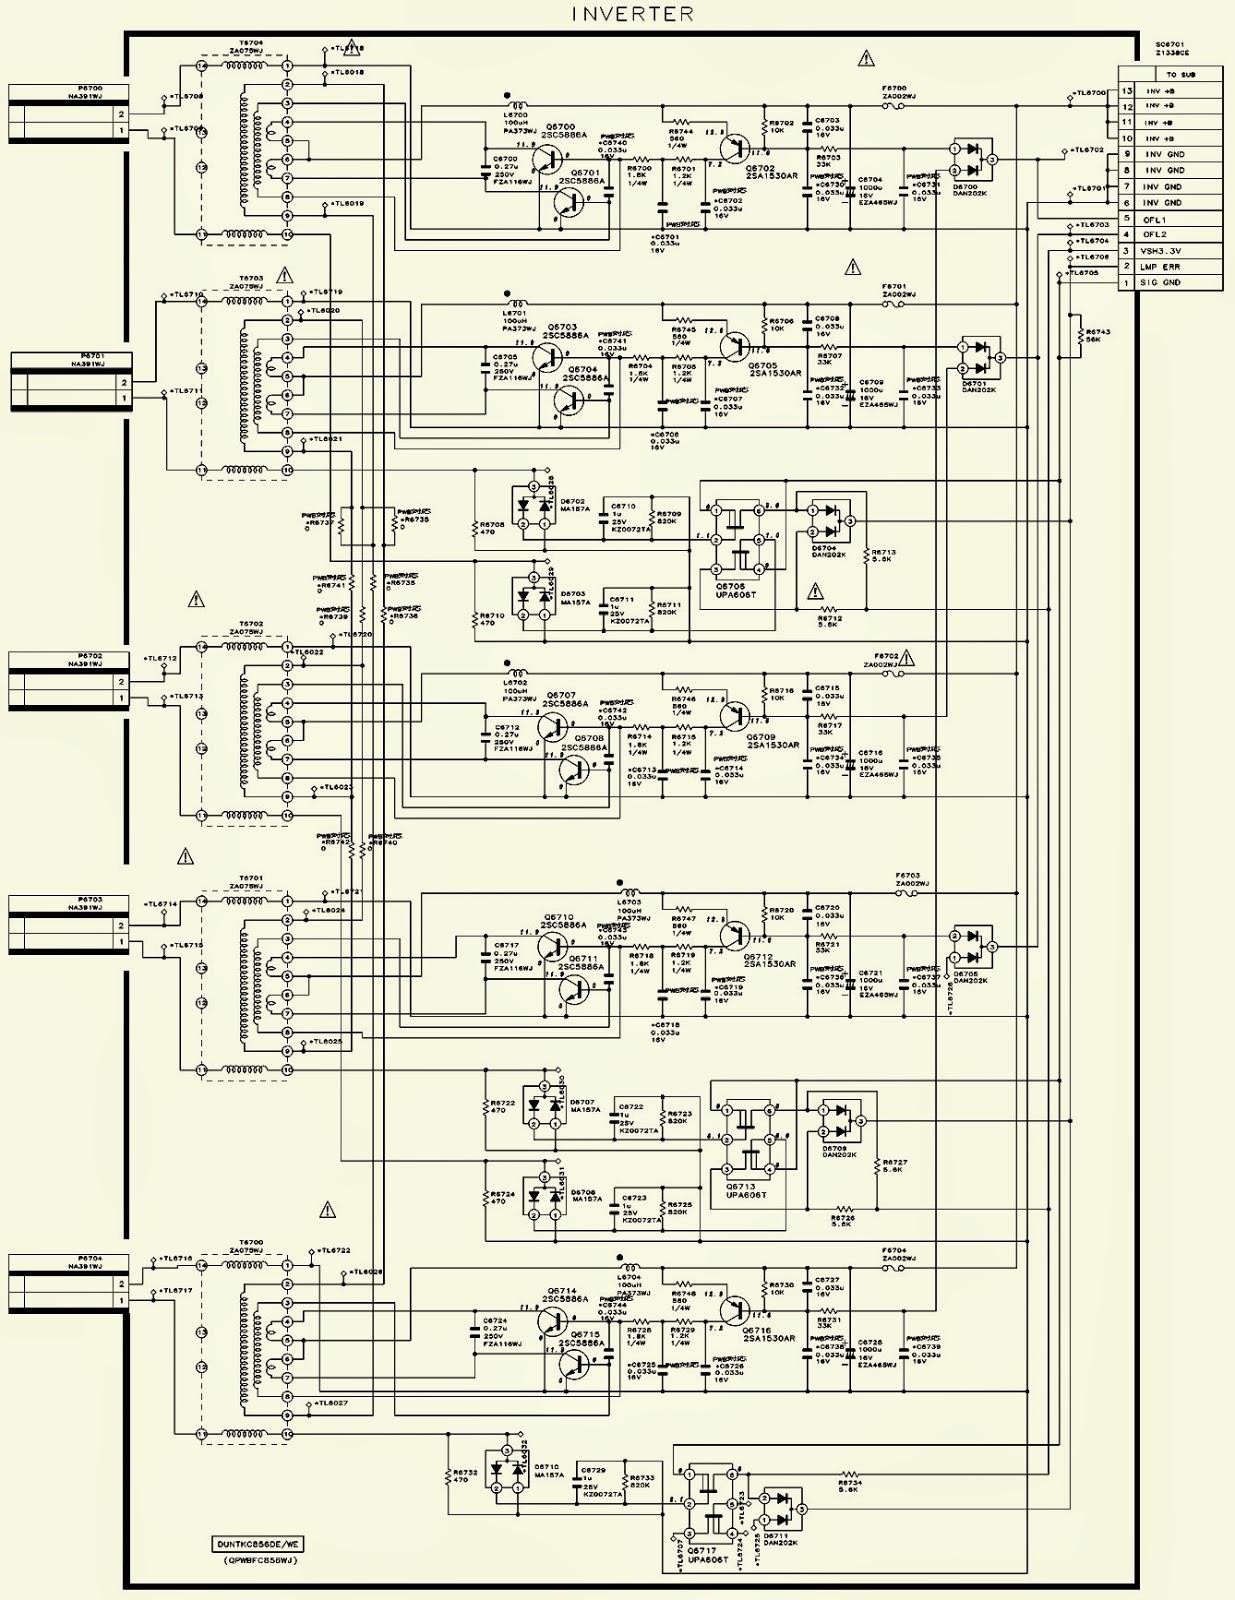 LC20SH1E     SHARP        SCHEMATIC       DIAGRAM        Circuit       Diagram